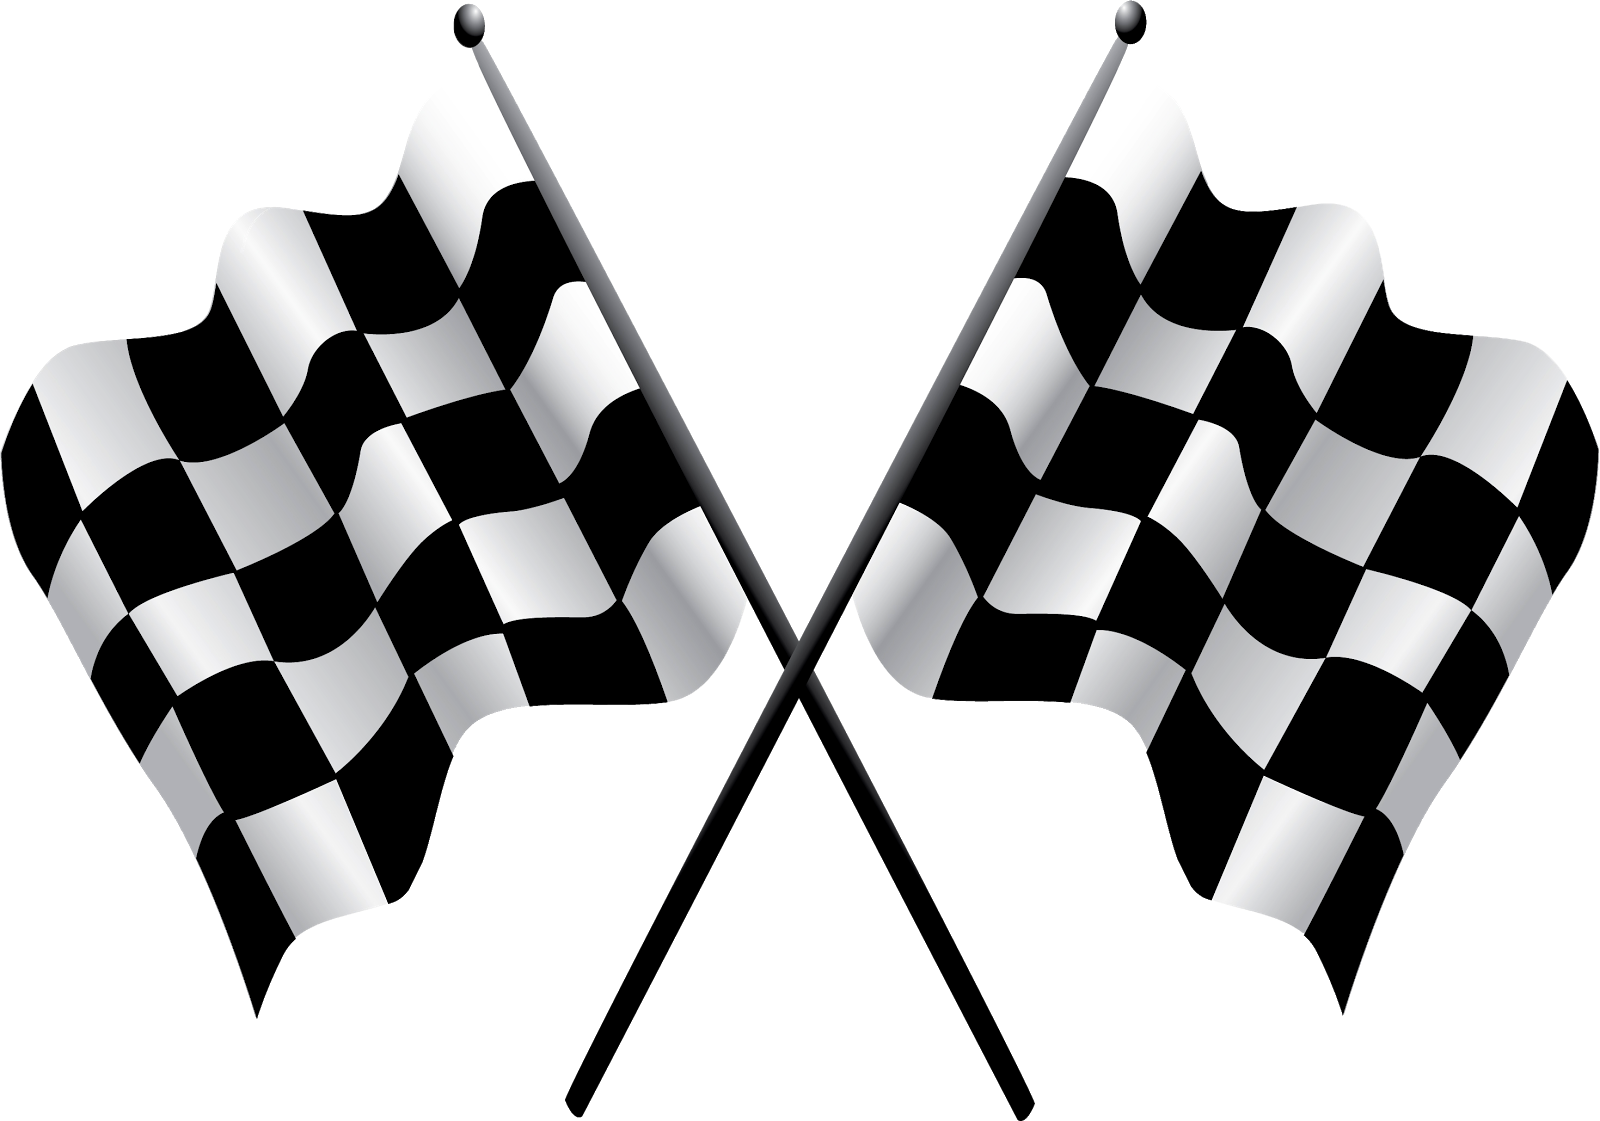 Formula 1 Flag Png Image Purepng Free Transparent Cc0 Png Image